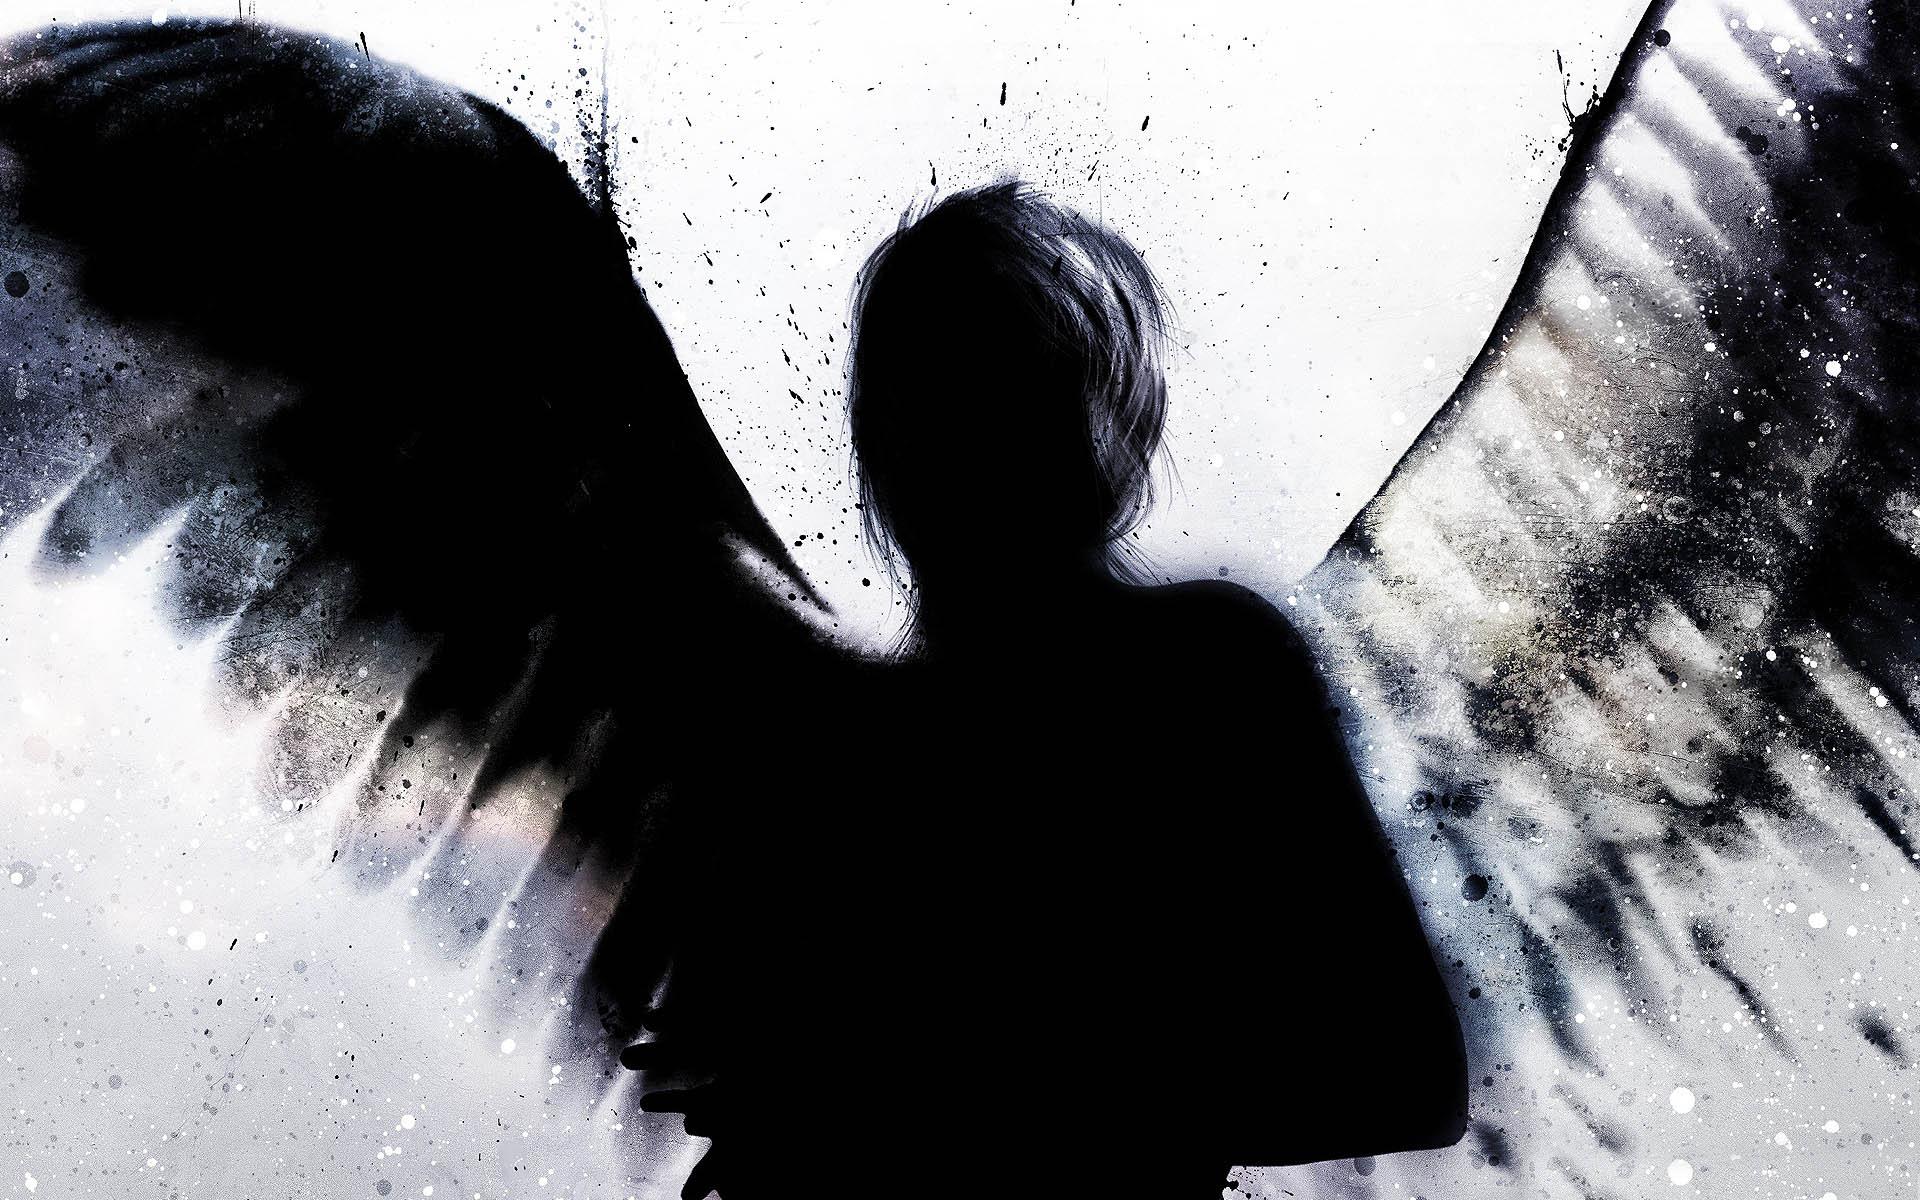 tumblr_static_angelshadowpic1